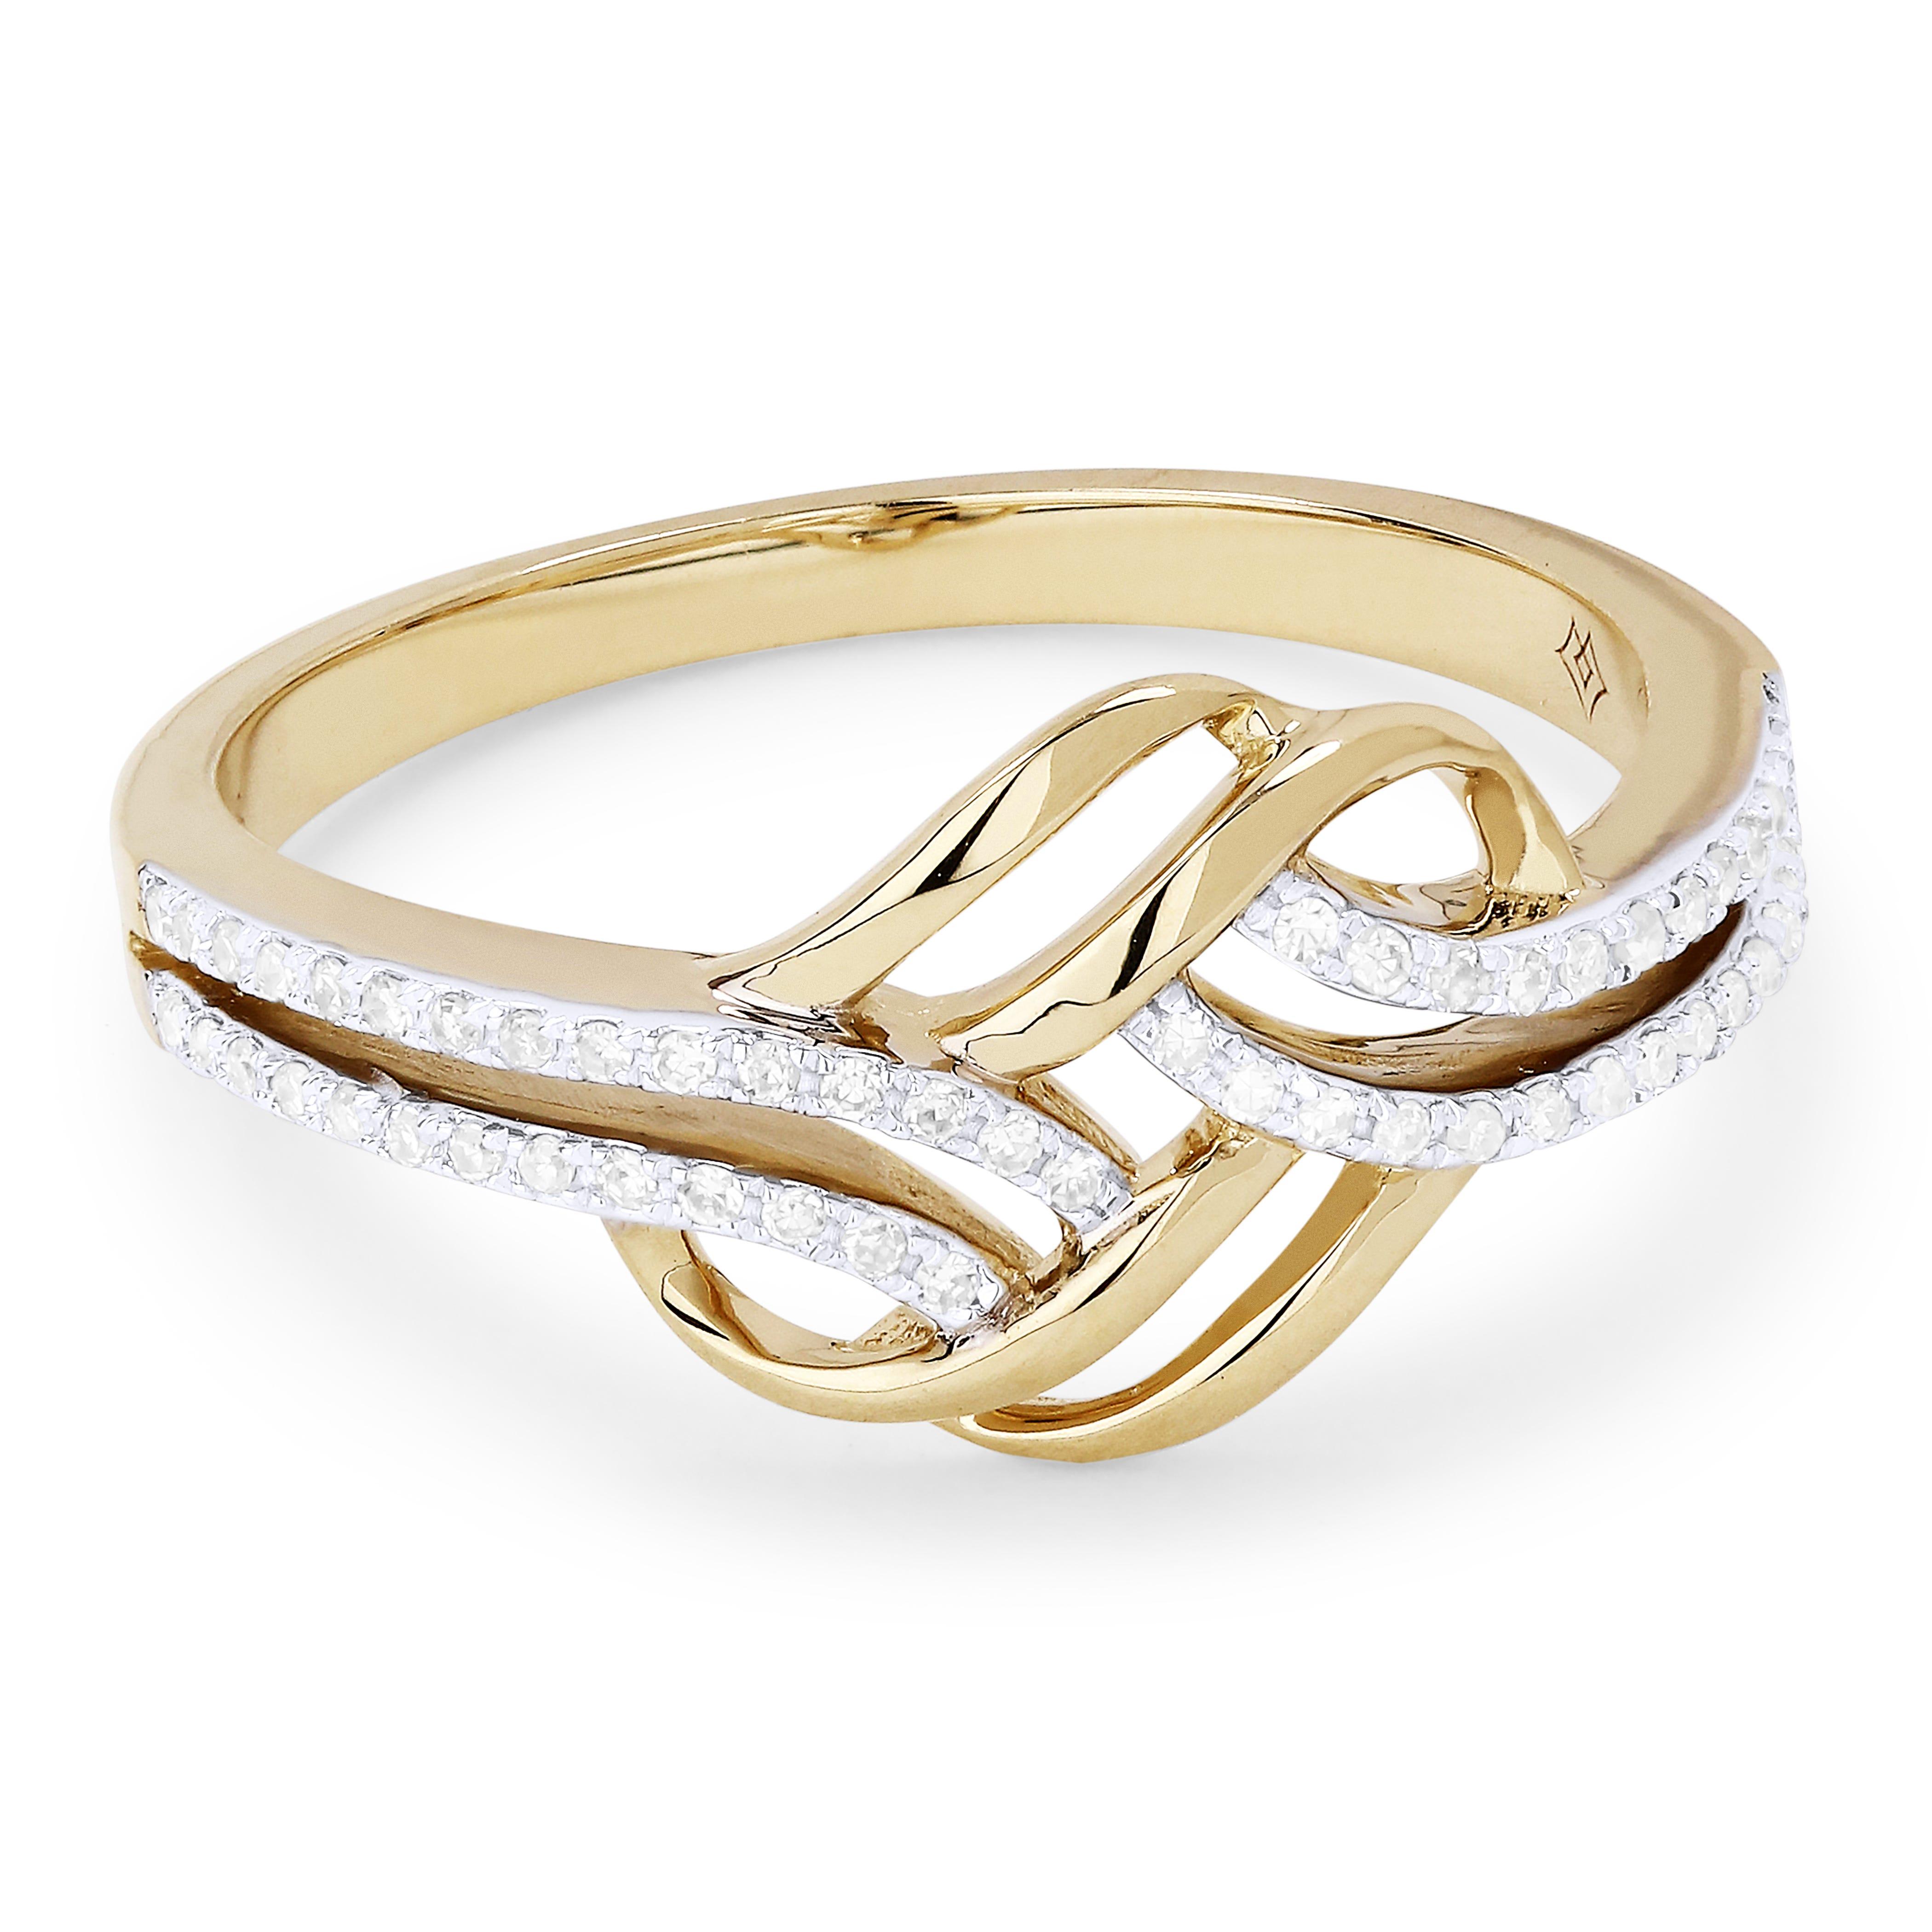 Diamond Swirl Fashion Ring in 14k Yellow Gold